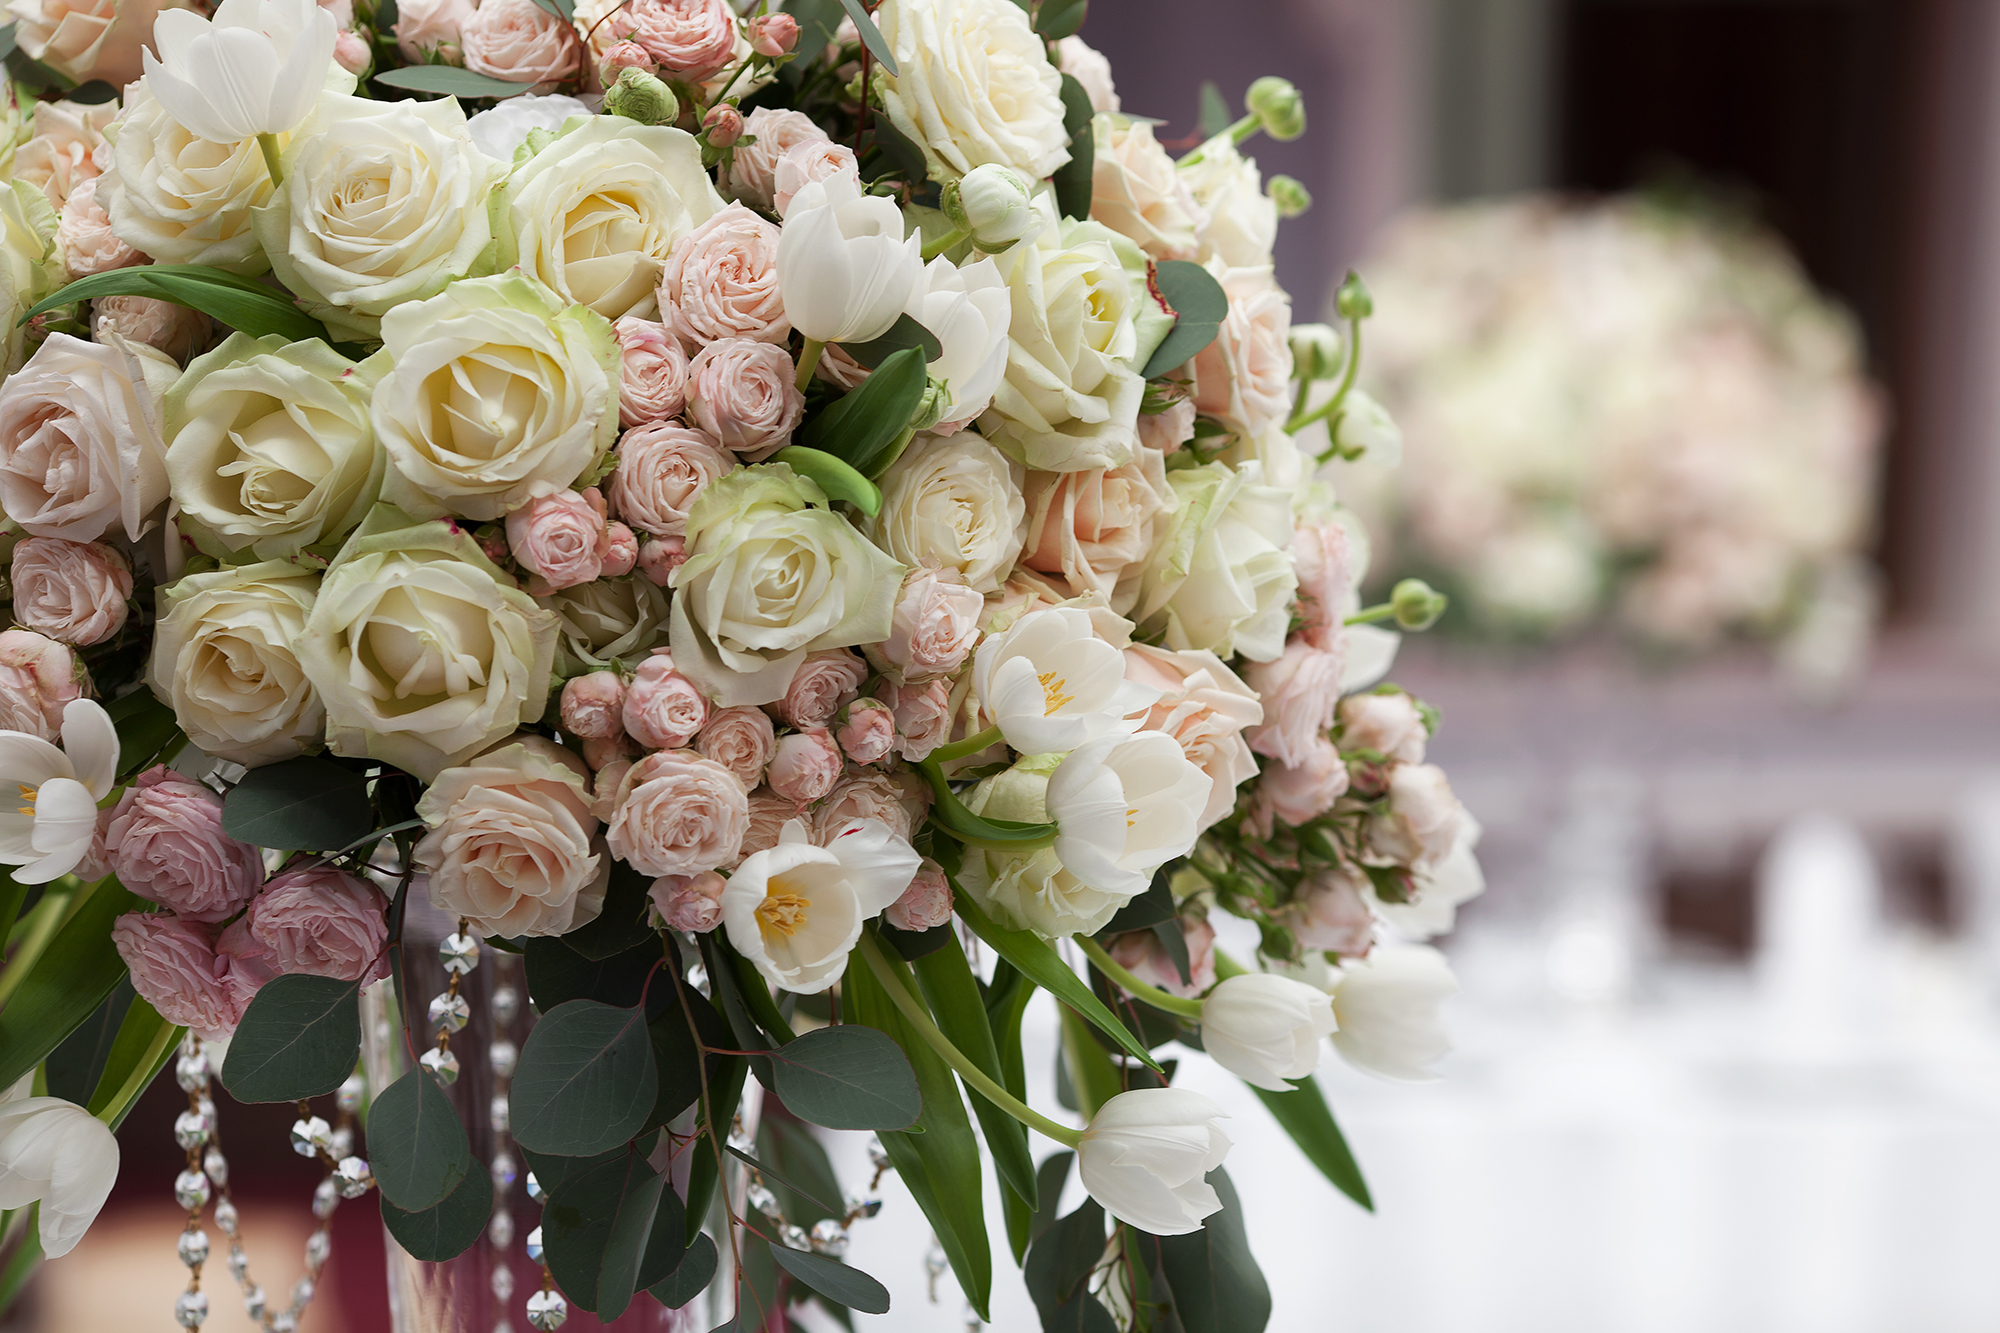 floral bouquets wedding photo - 1